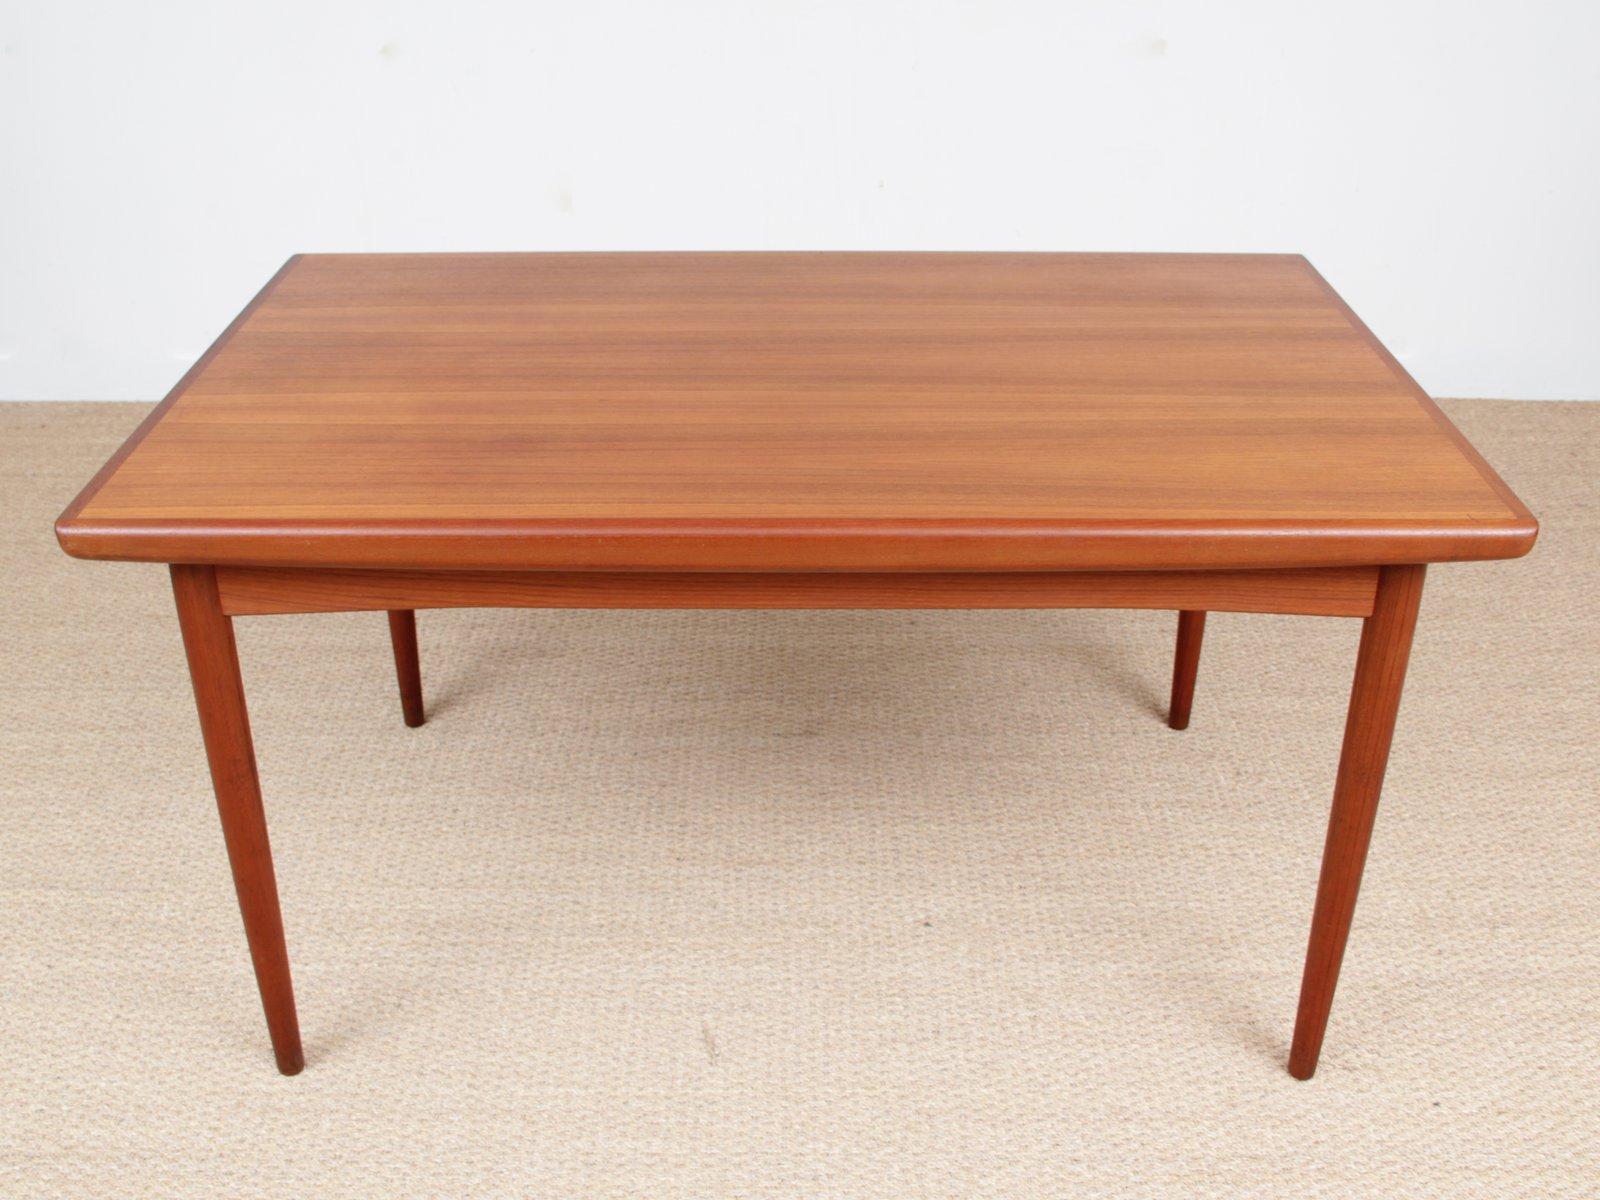 Scandinavian teak dining table from dyrlund 1950s